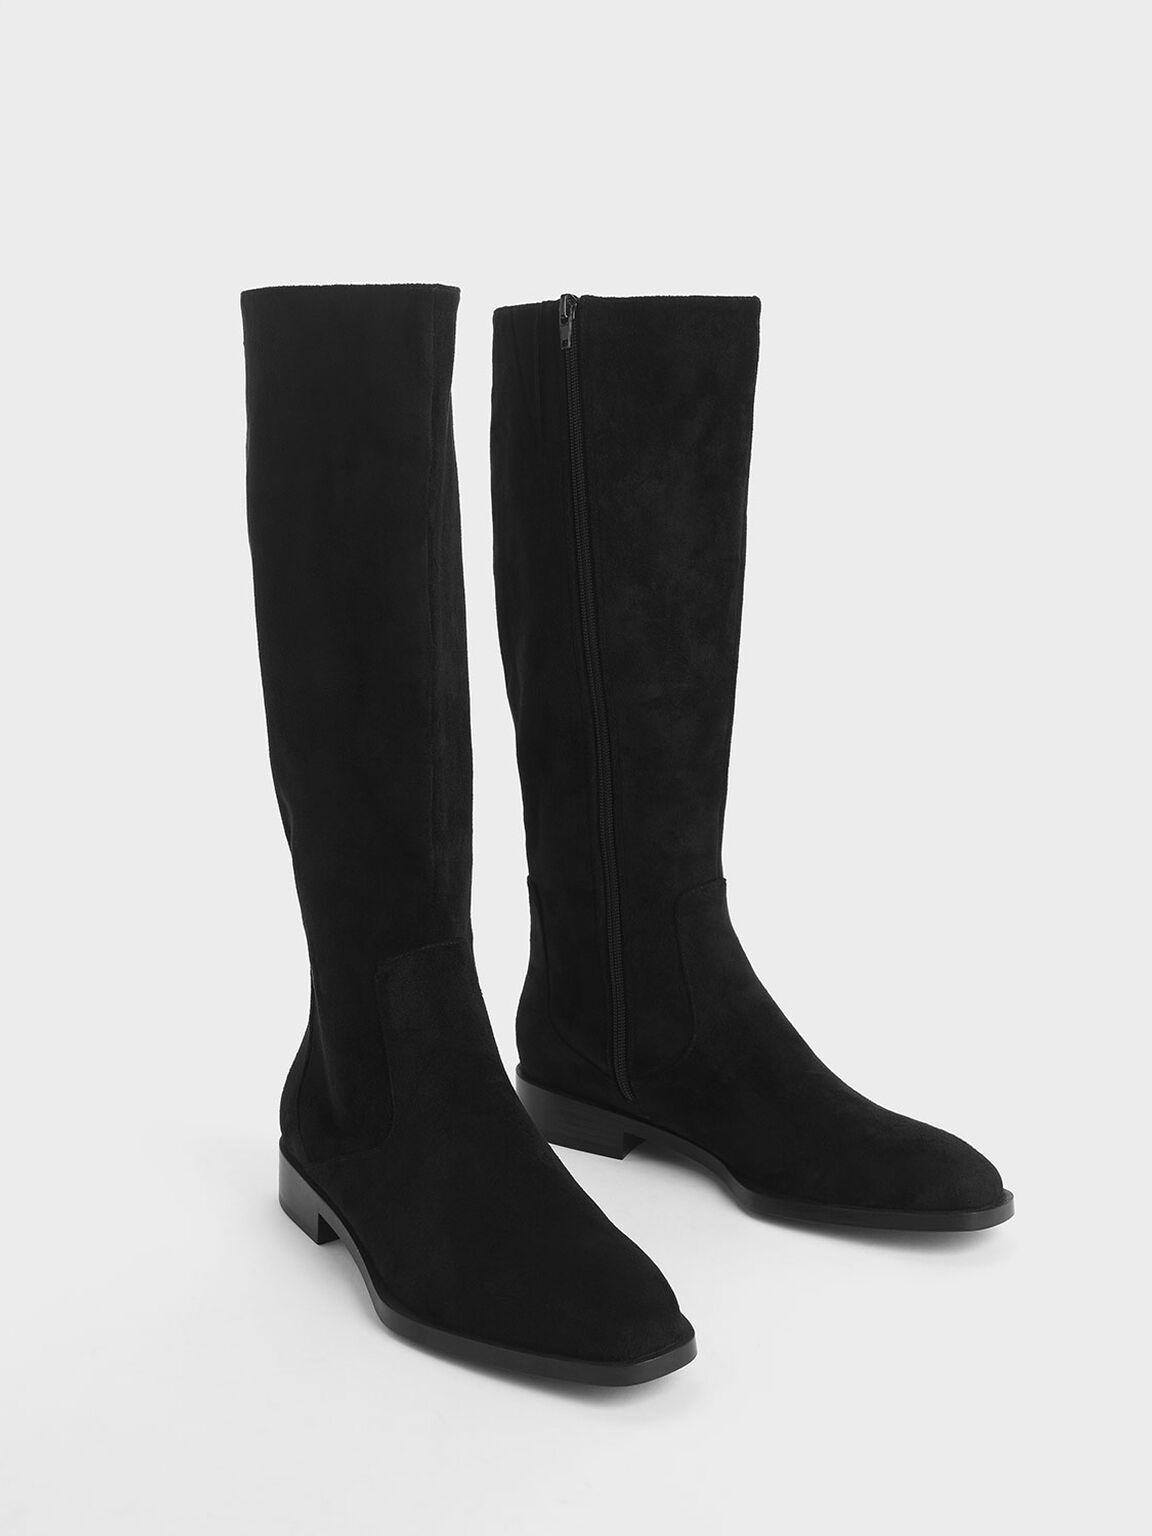 Zip-Up Knee High Flat Boots, Black Textured, hi-res